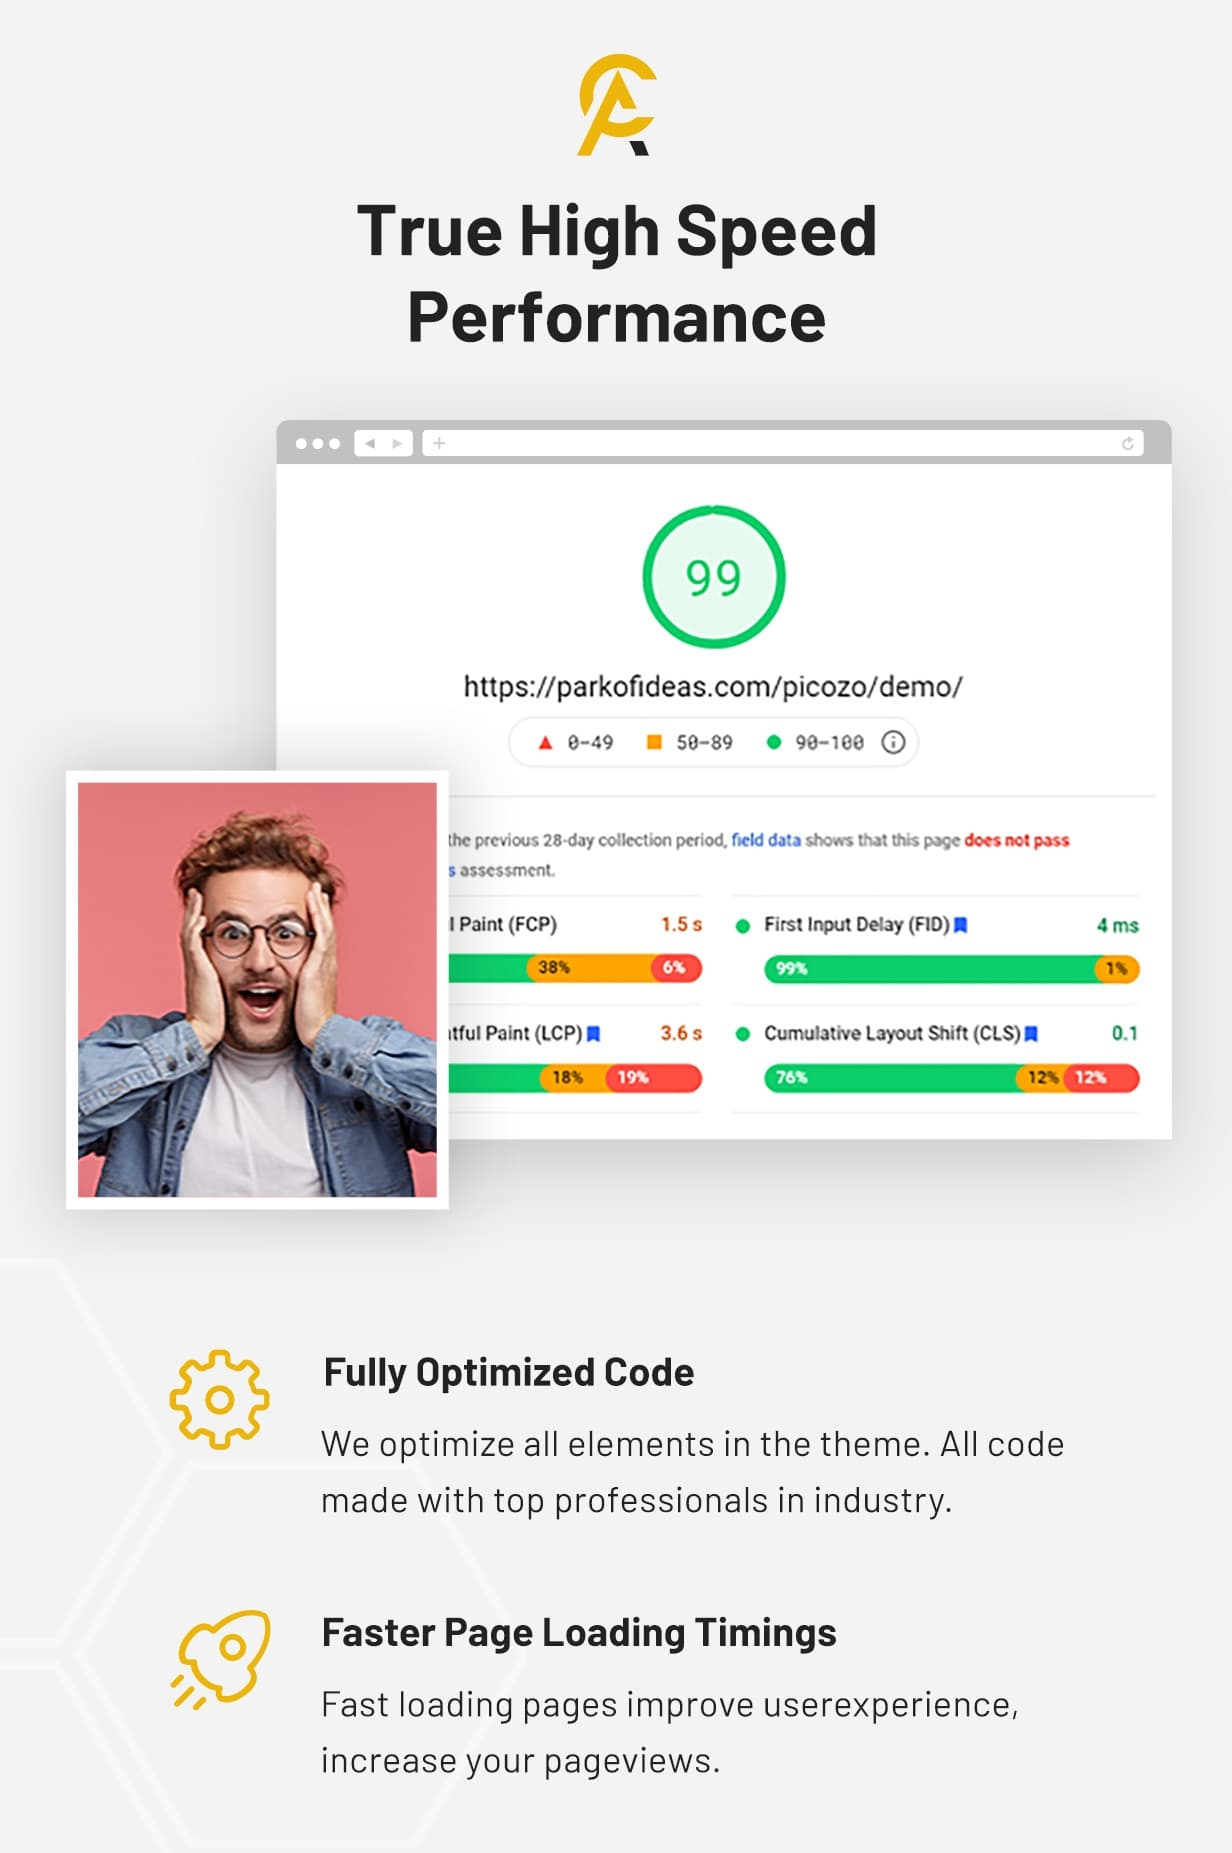 Antek - True High Speed Performance